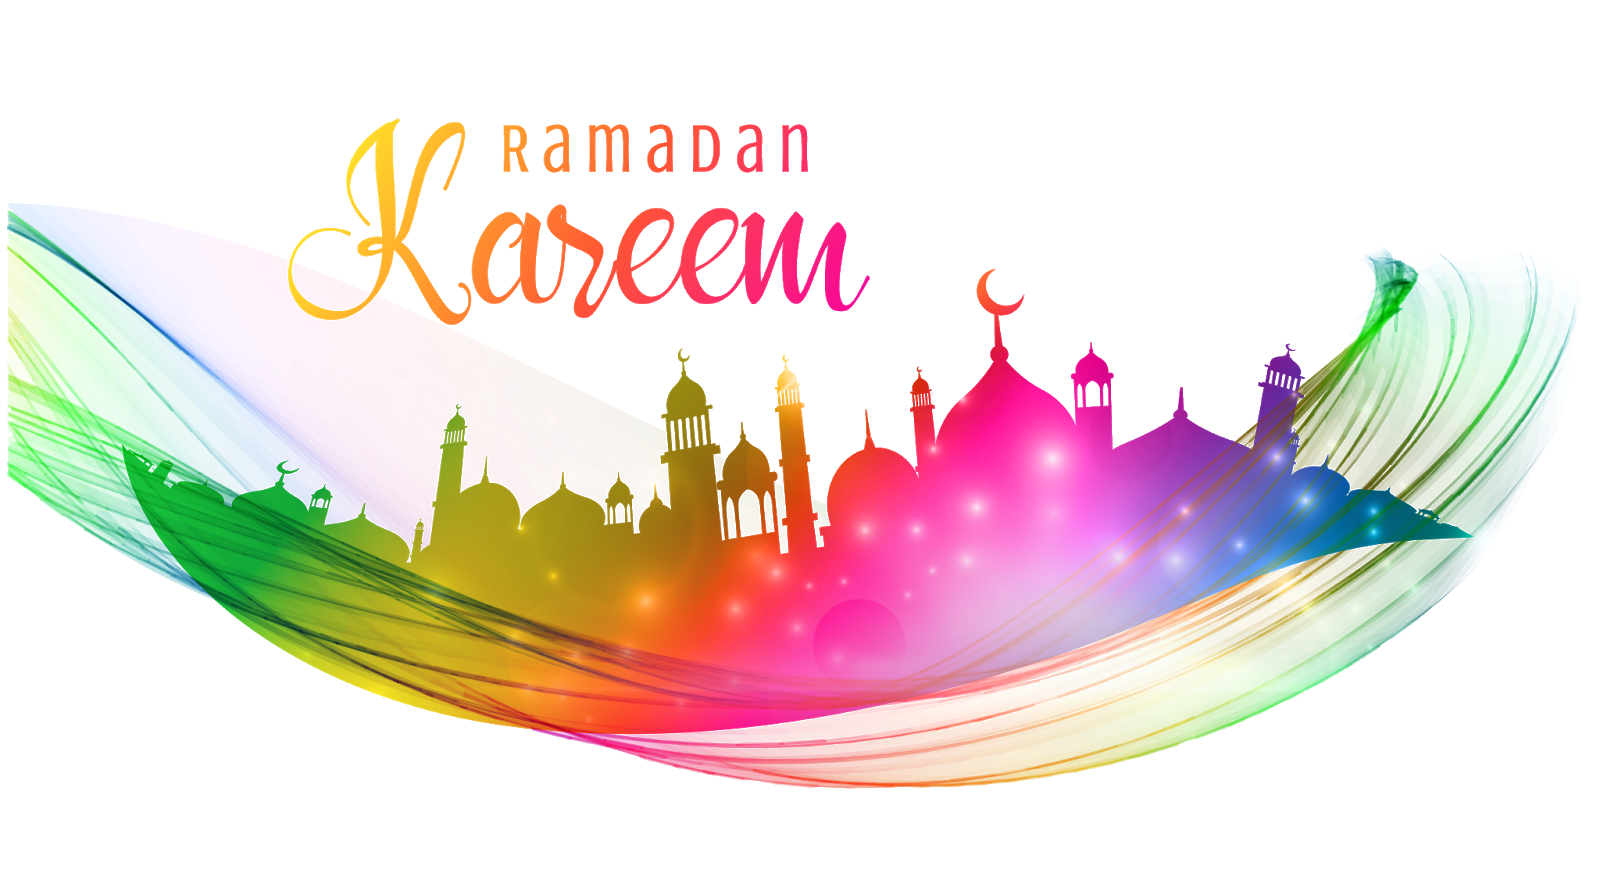 ramadan kareem png - Wedding Posters for Ramadan Kareem Transparent  45ifm